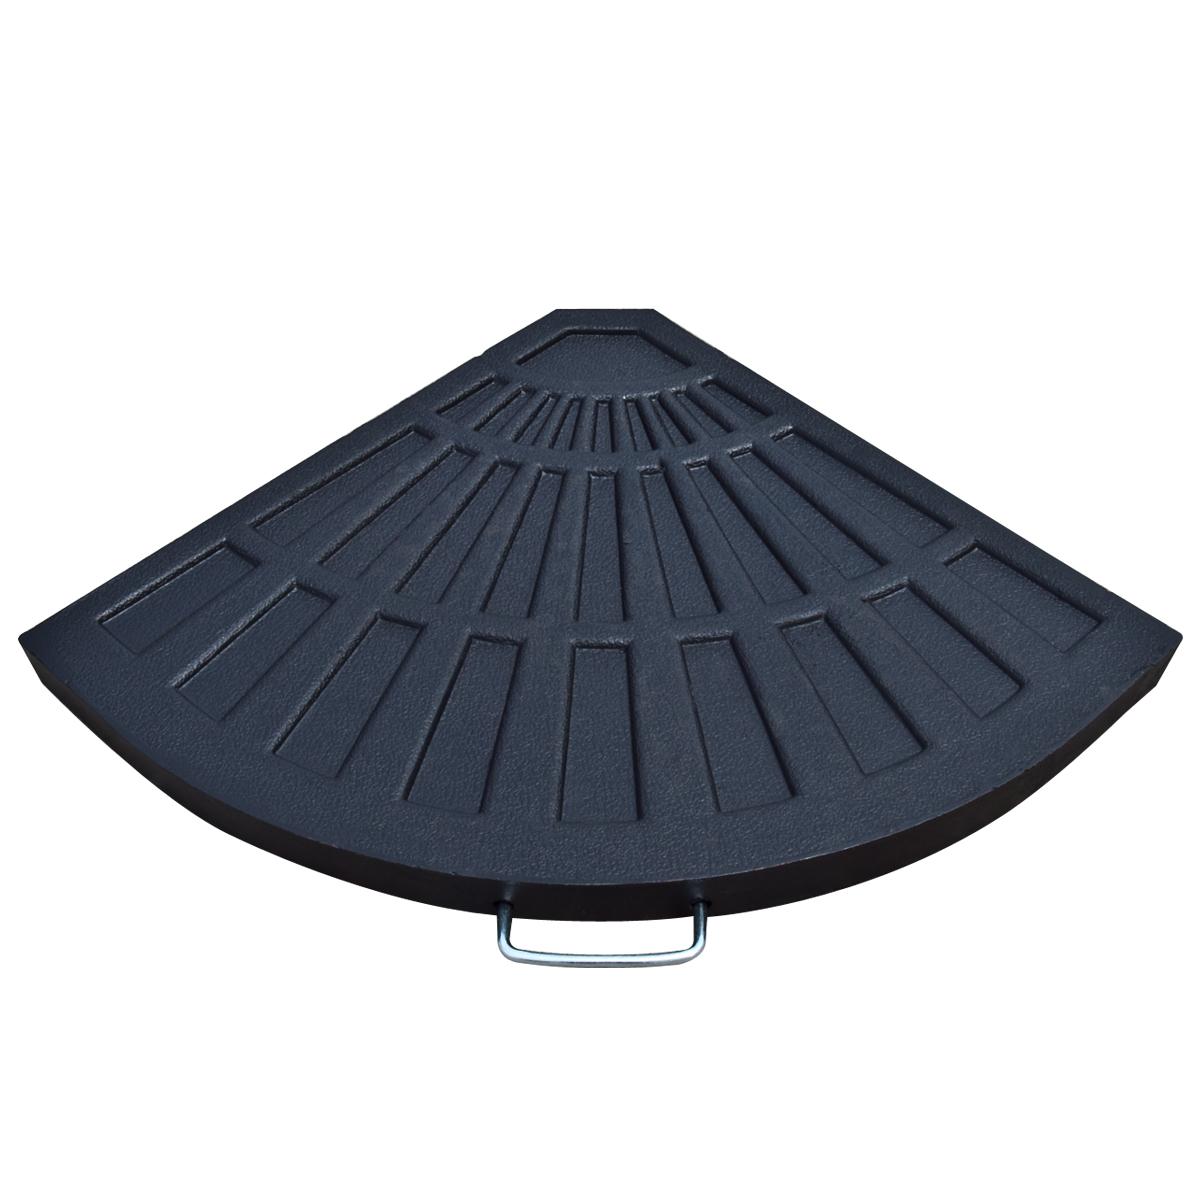 Patio Umbrella Alternative: Patio Umbrella Stand Vintage Finish Outdoor Table Pole 30